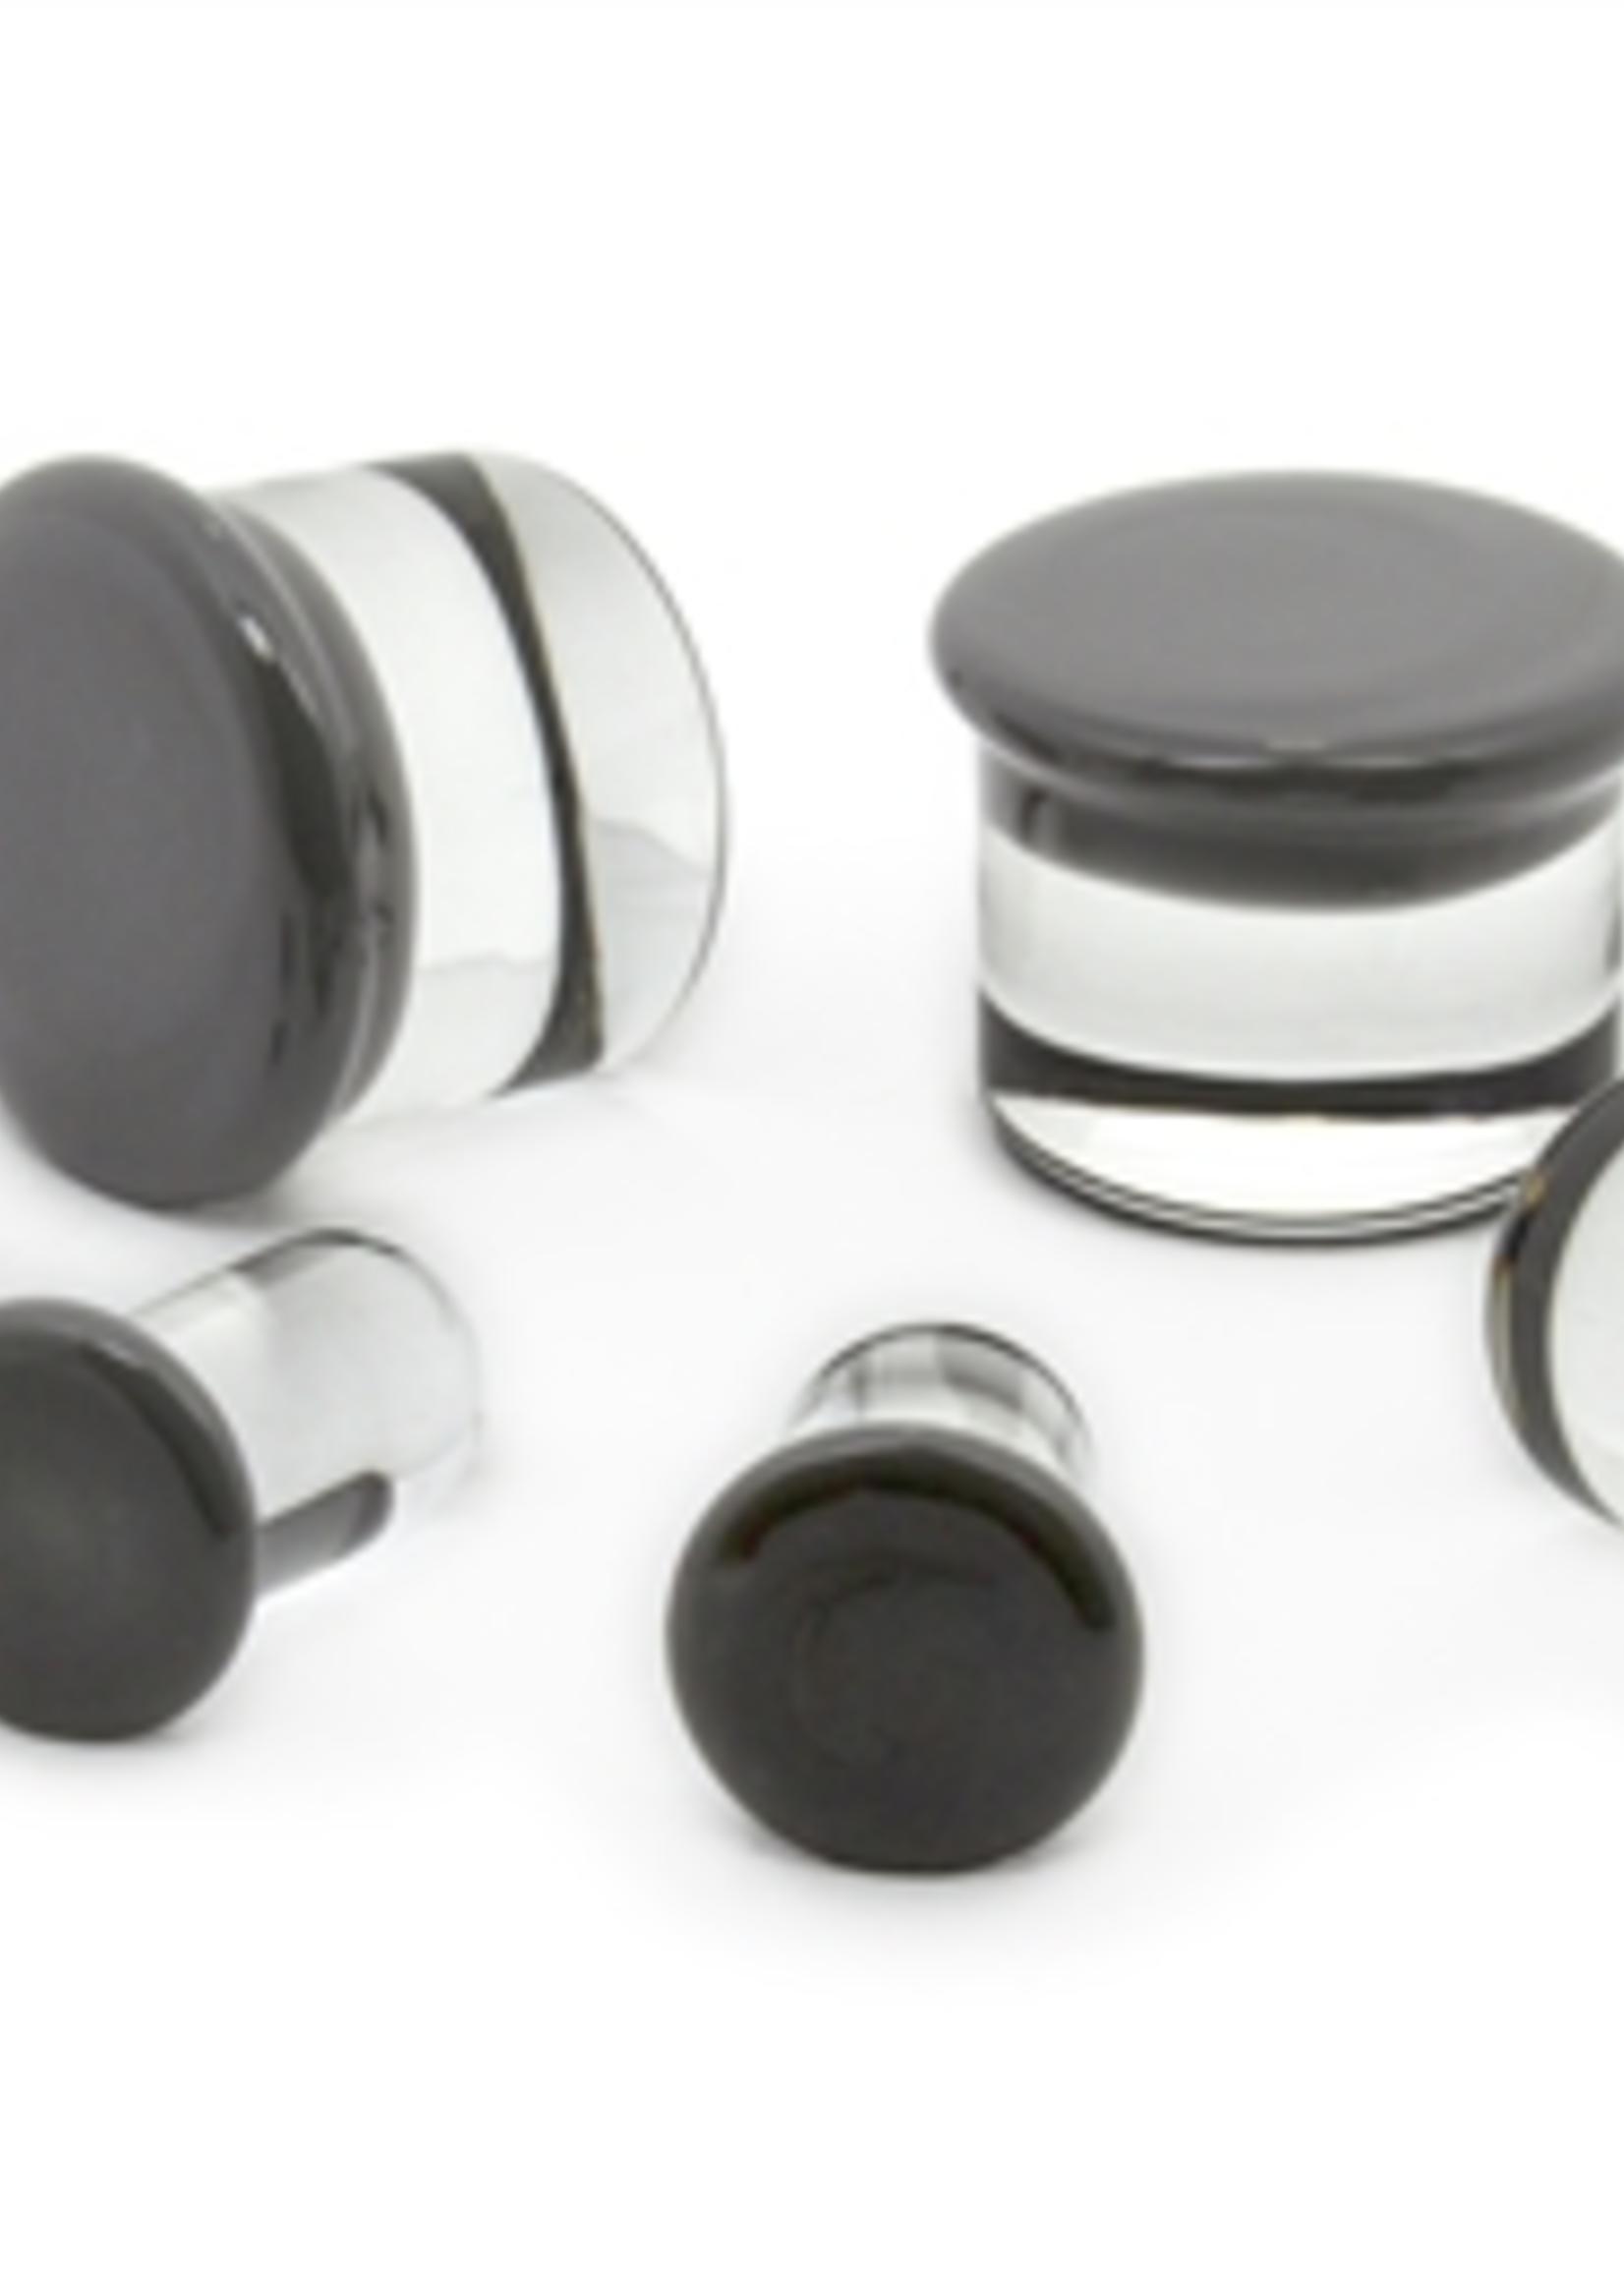 24mm SF Glass Plugs